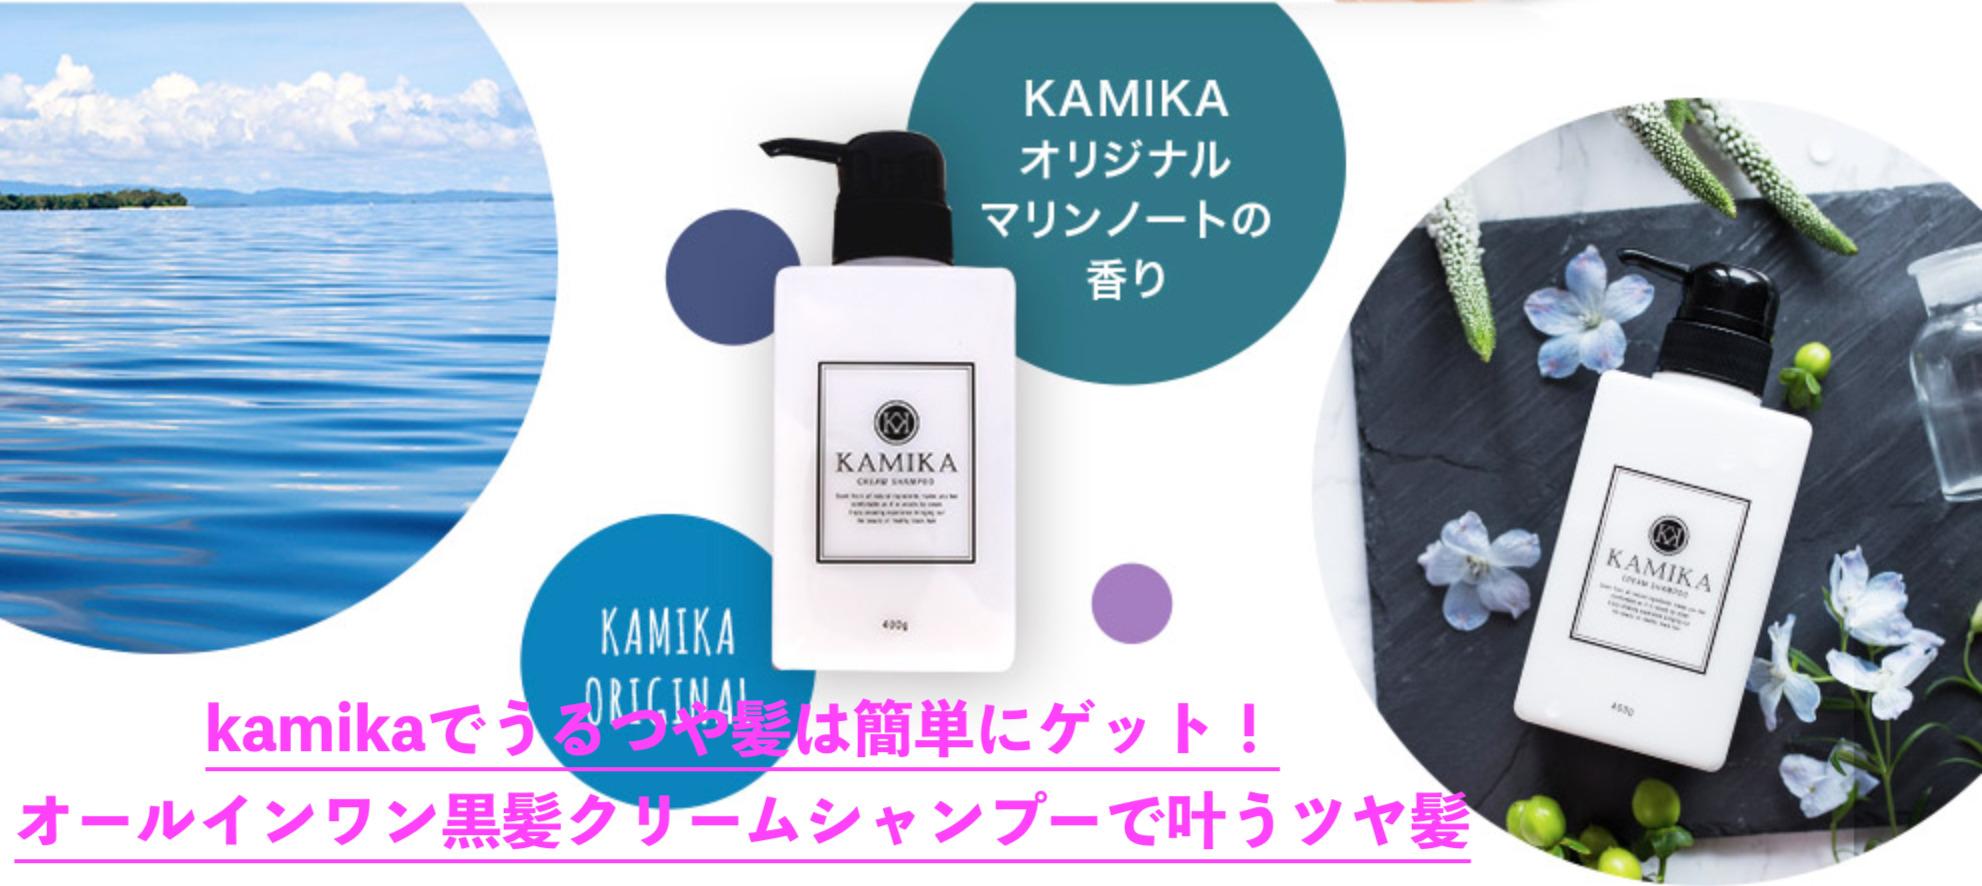 kamika黒髪クリームシャンプー